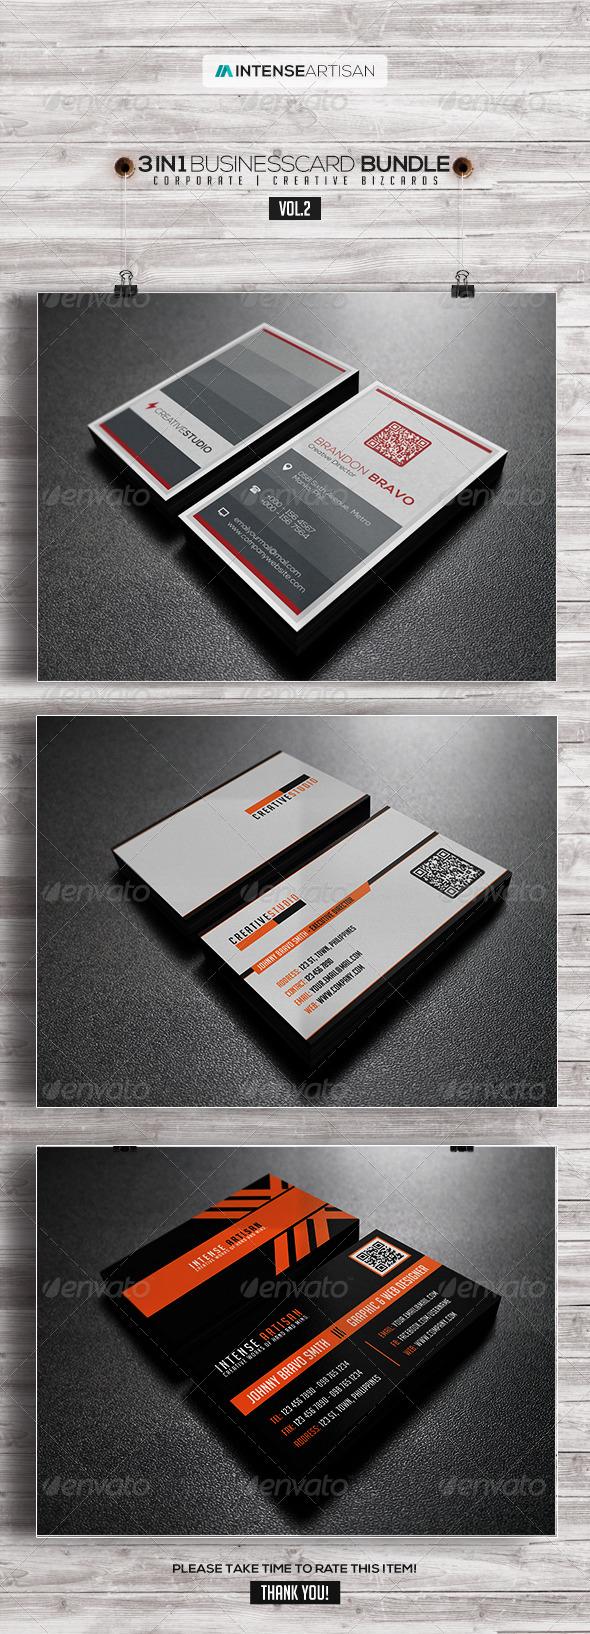 GraphicRiver 3IN1-BUSINESS CARD BUNDLE V.2 8013179